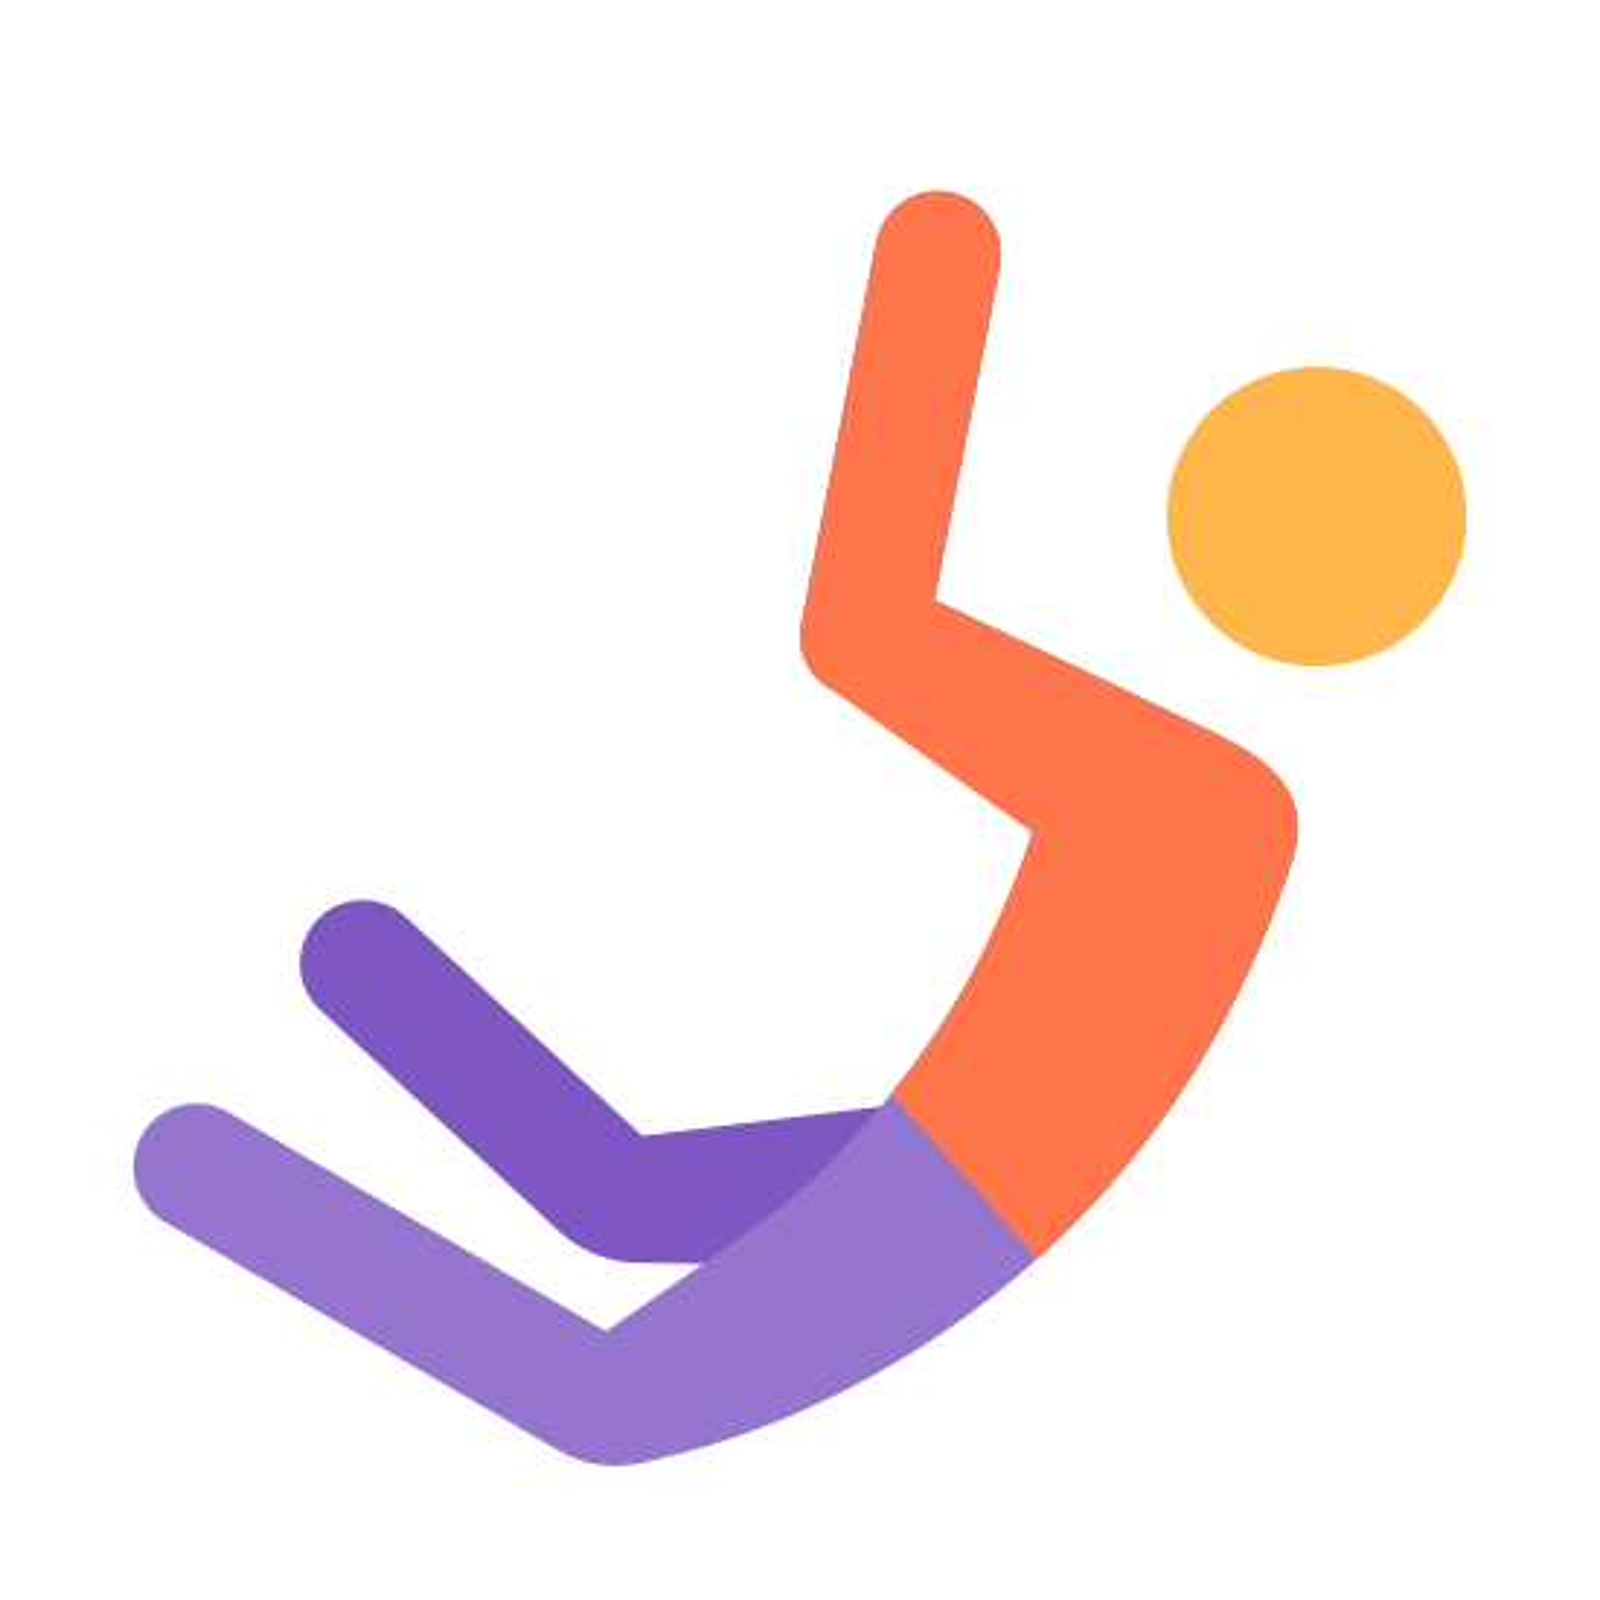 Base Jumping icon